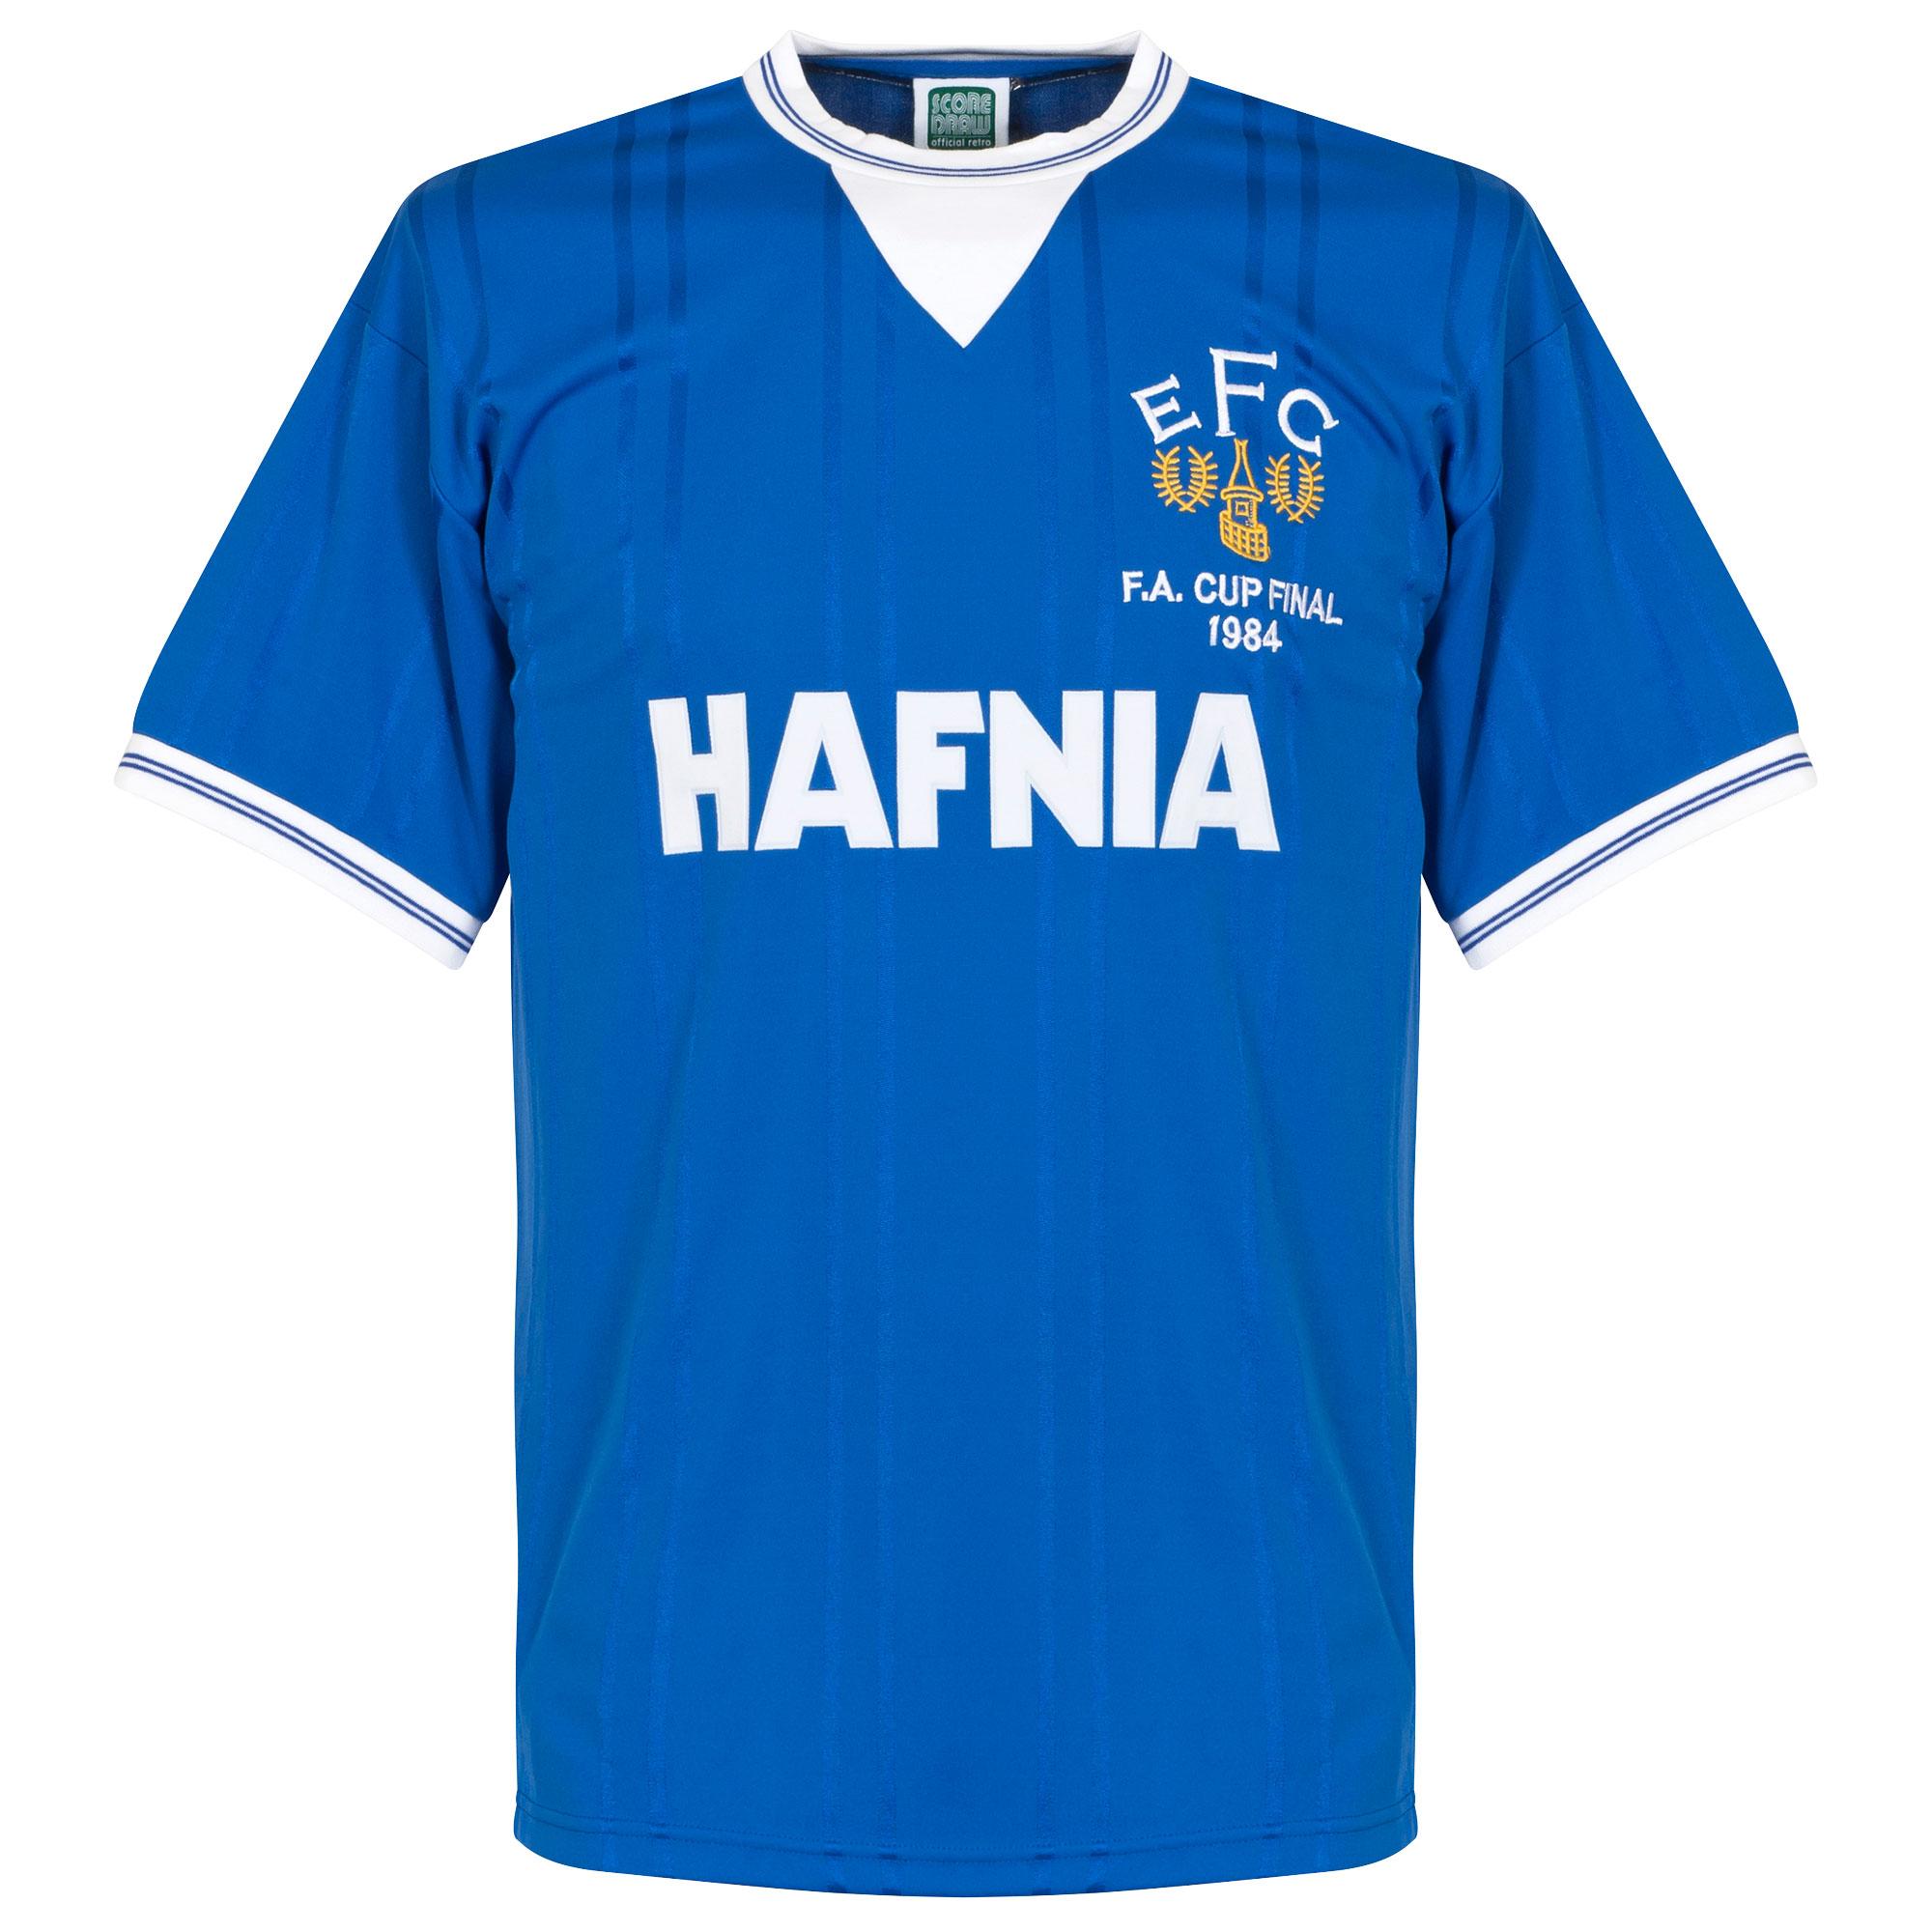 Score Draw Everton Home FA Cup Final Retro Shirt 1983-1984